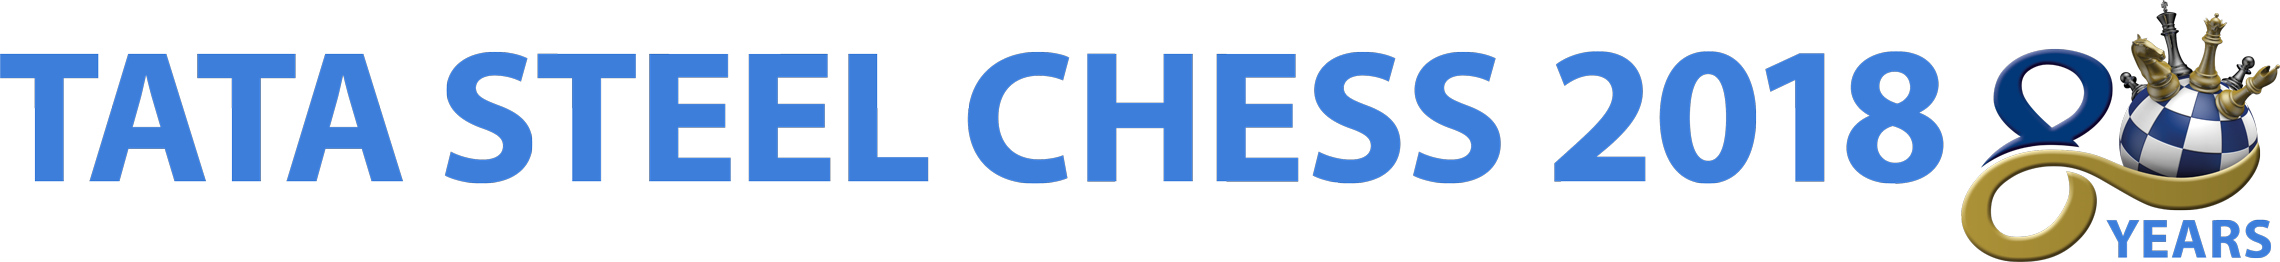 Tata Steel Chess 2018